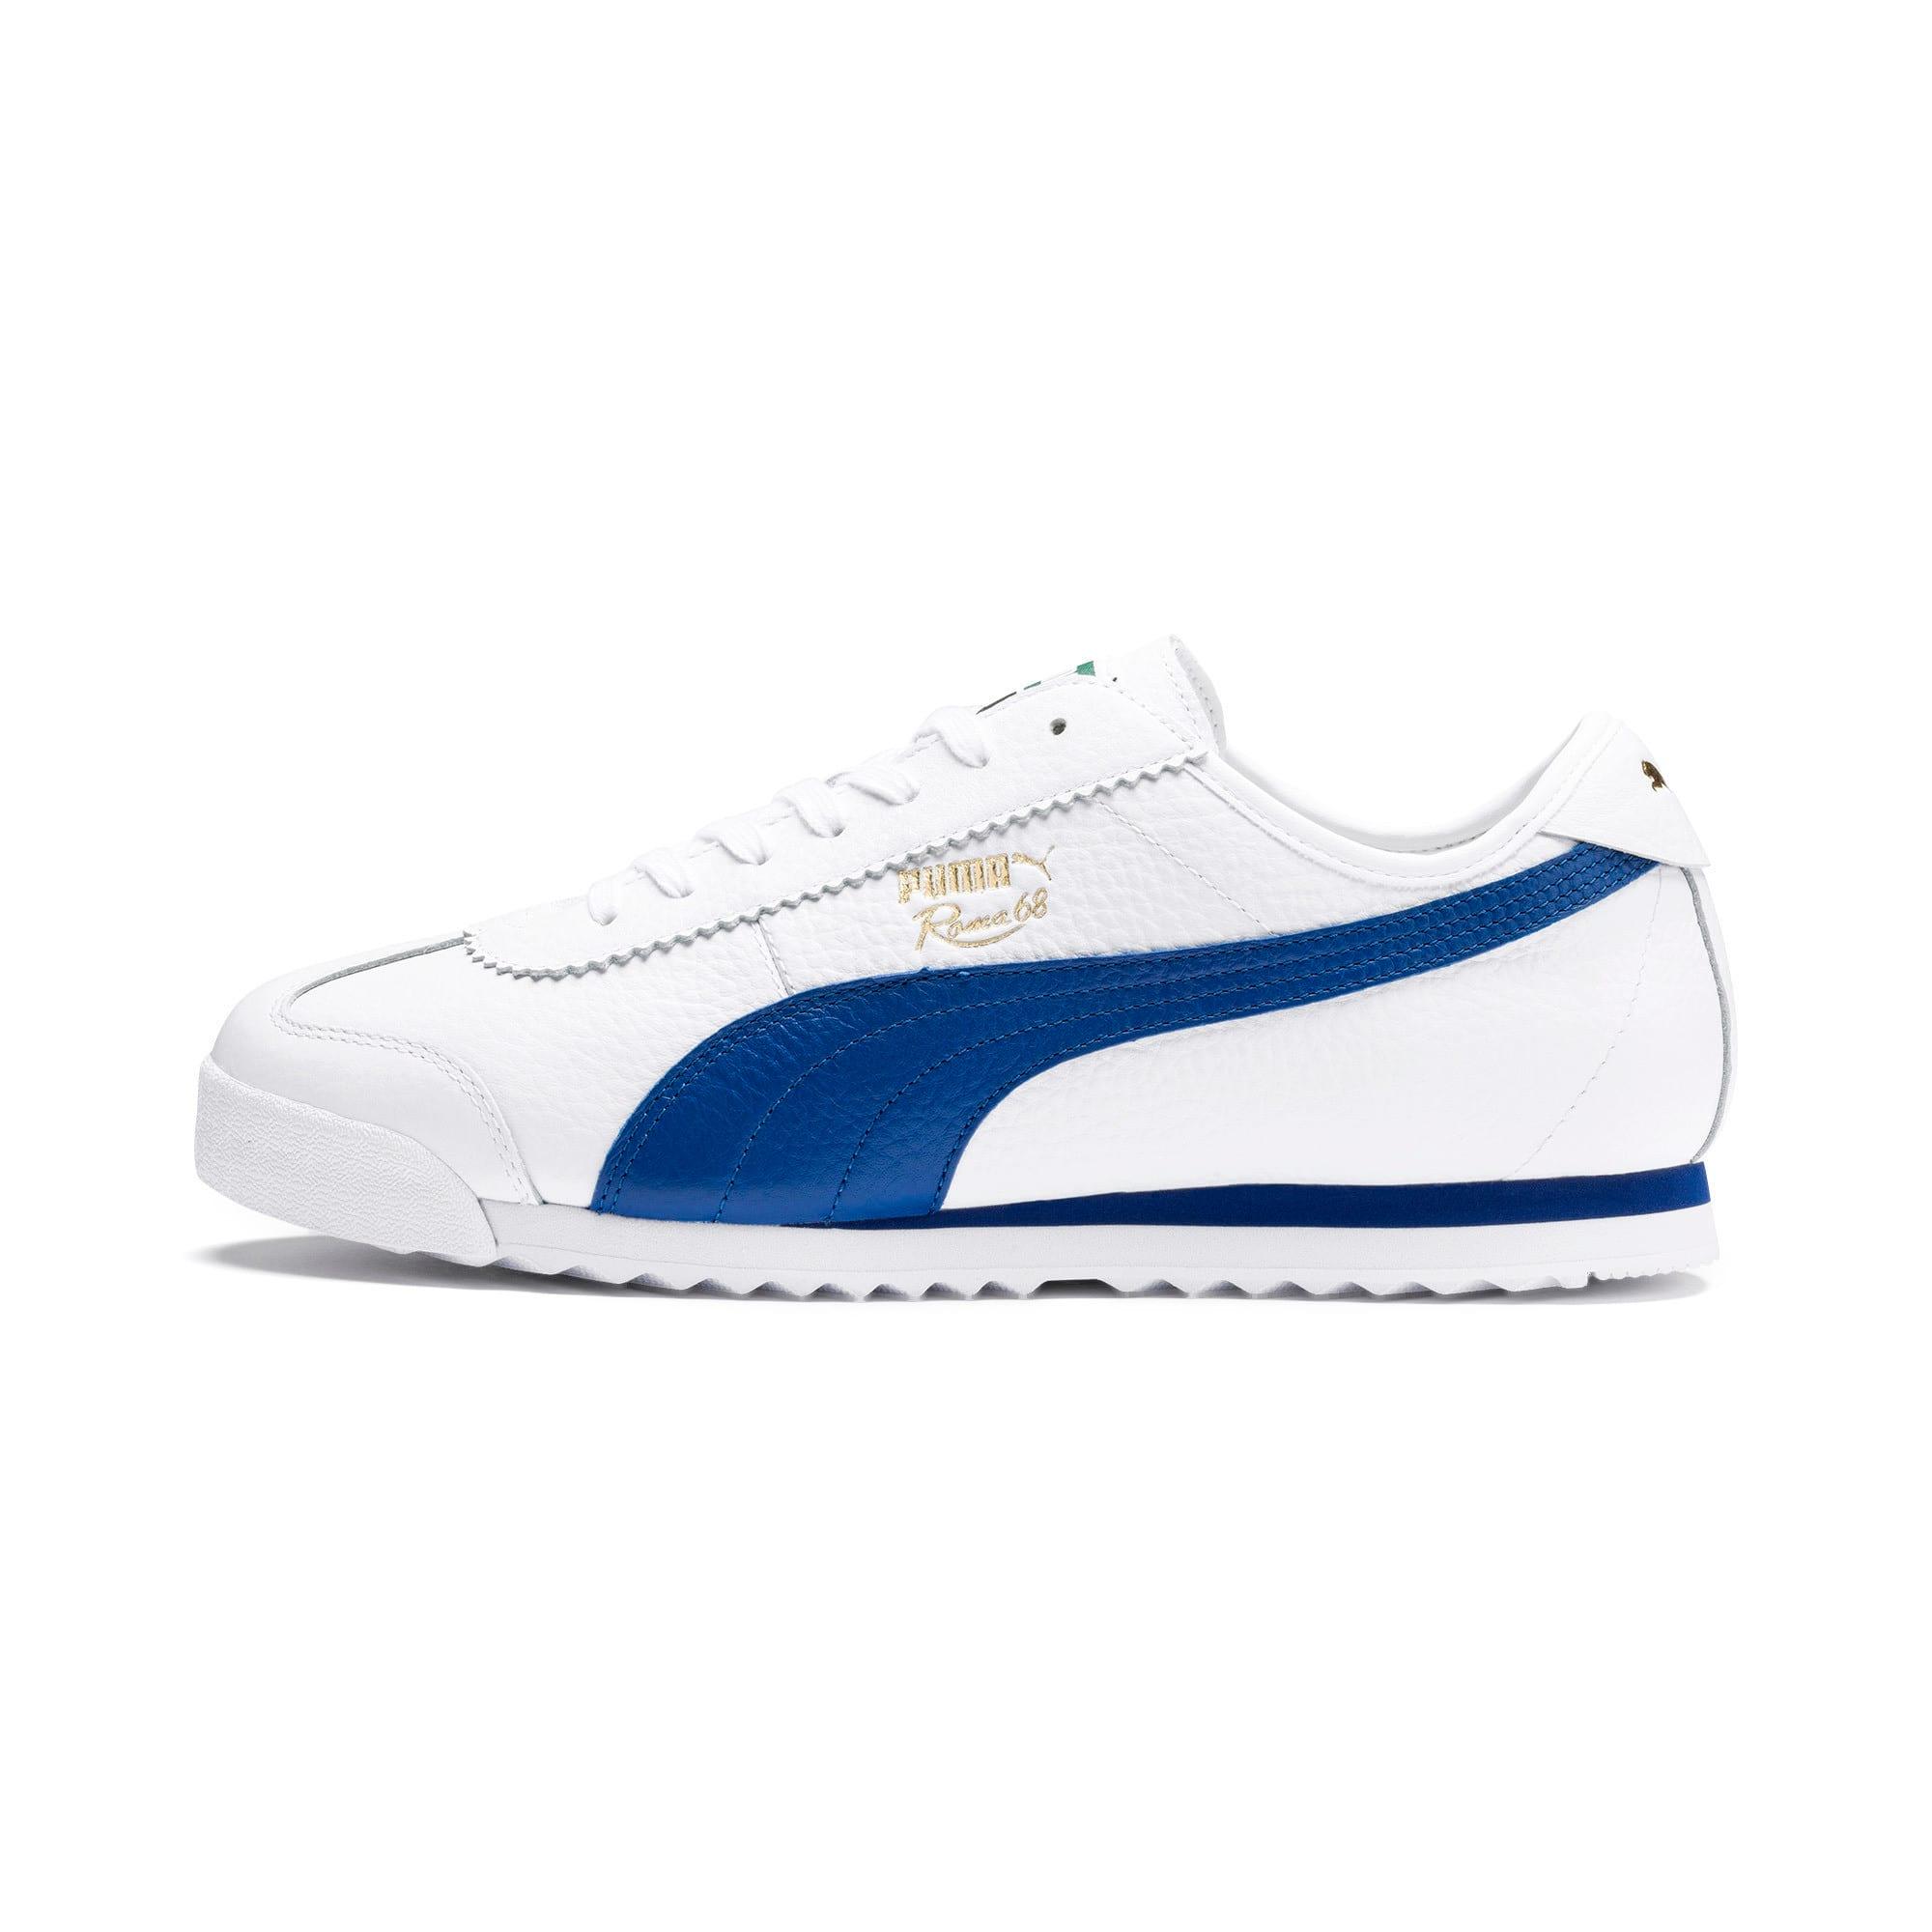 Miniatura 1 de Zapatos deportivos Roma '68 Vintage, Puma White-Galaxy Blue, mediano